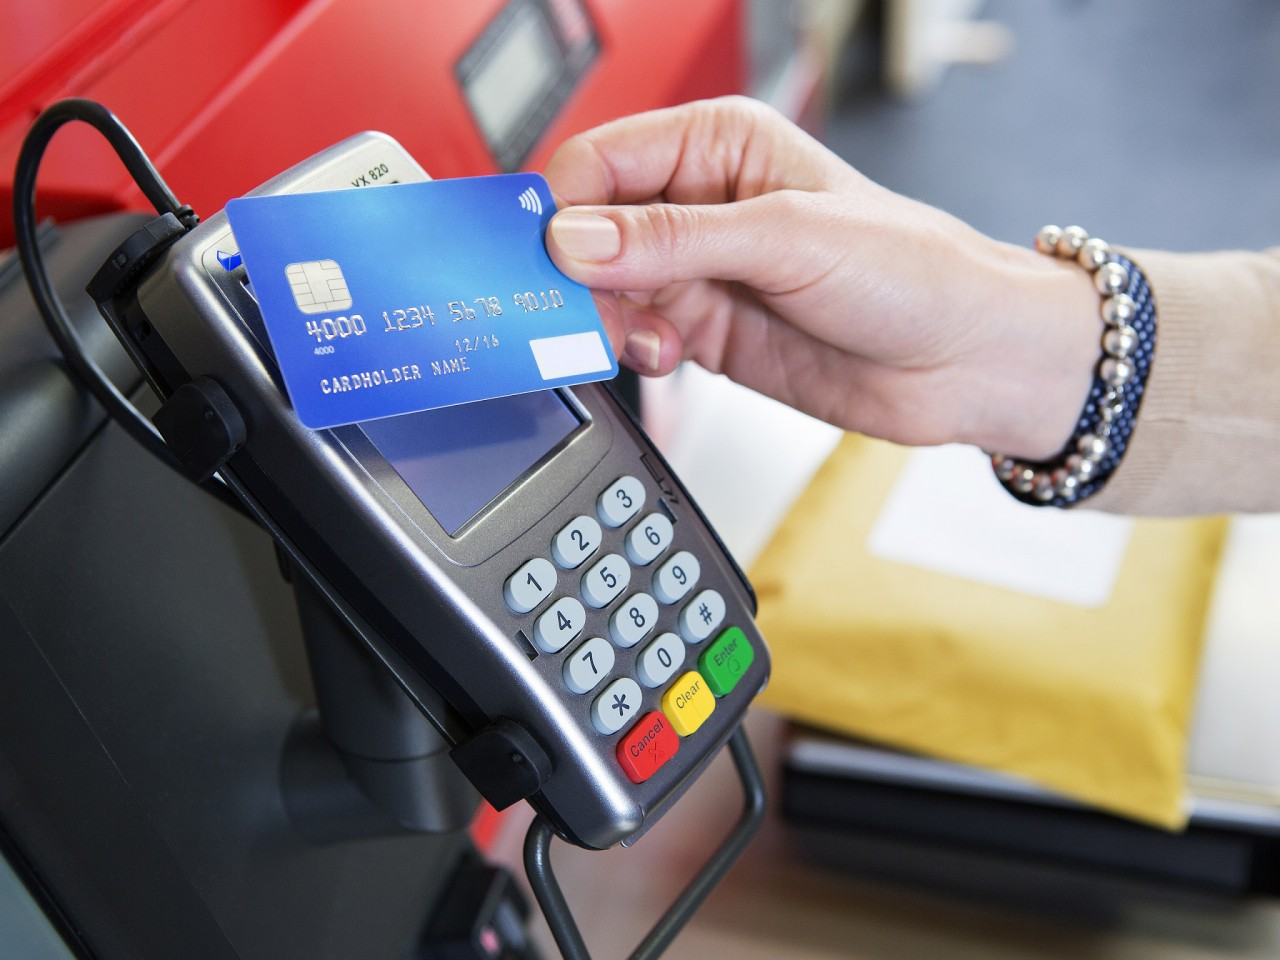 kak prikladyvat kartu k terminalu dlya oplaty poryadok dejstvij